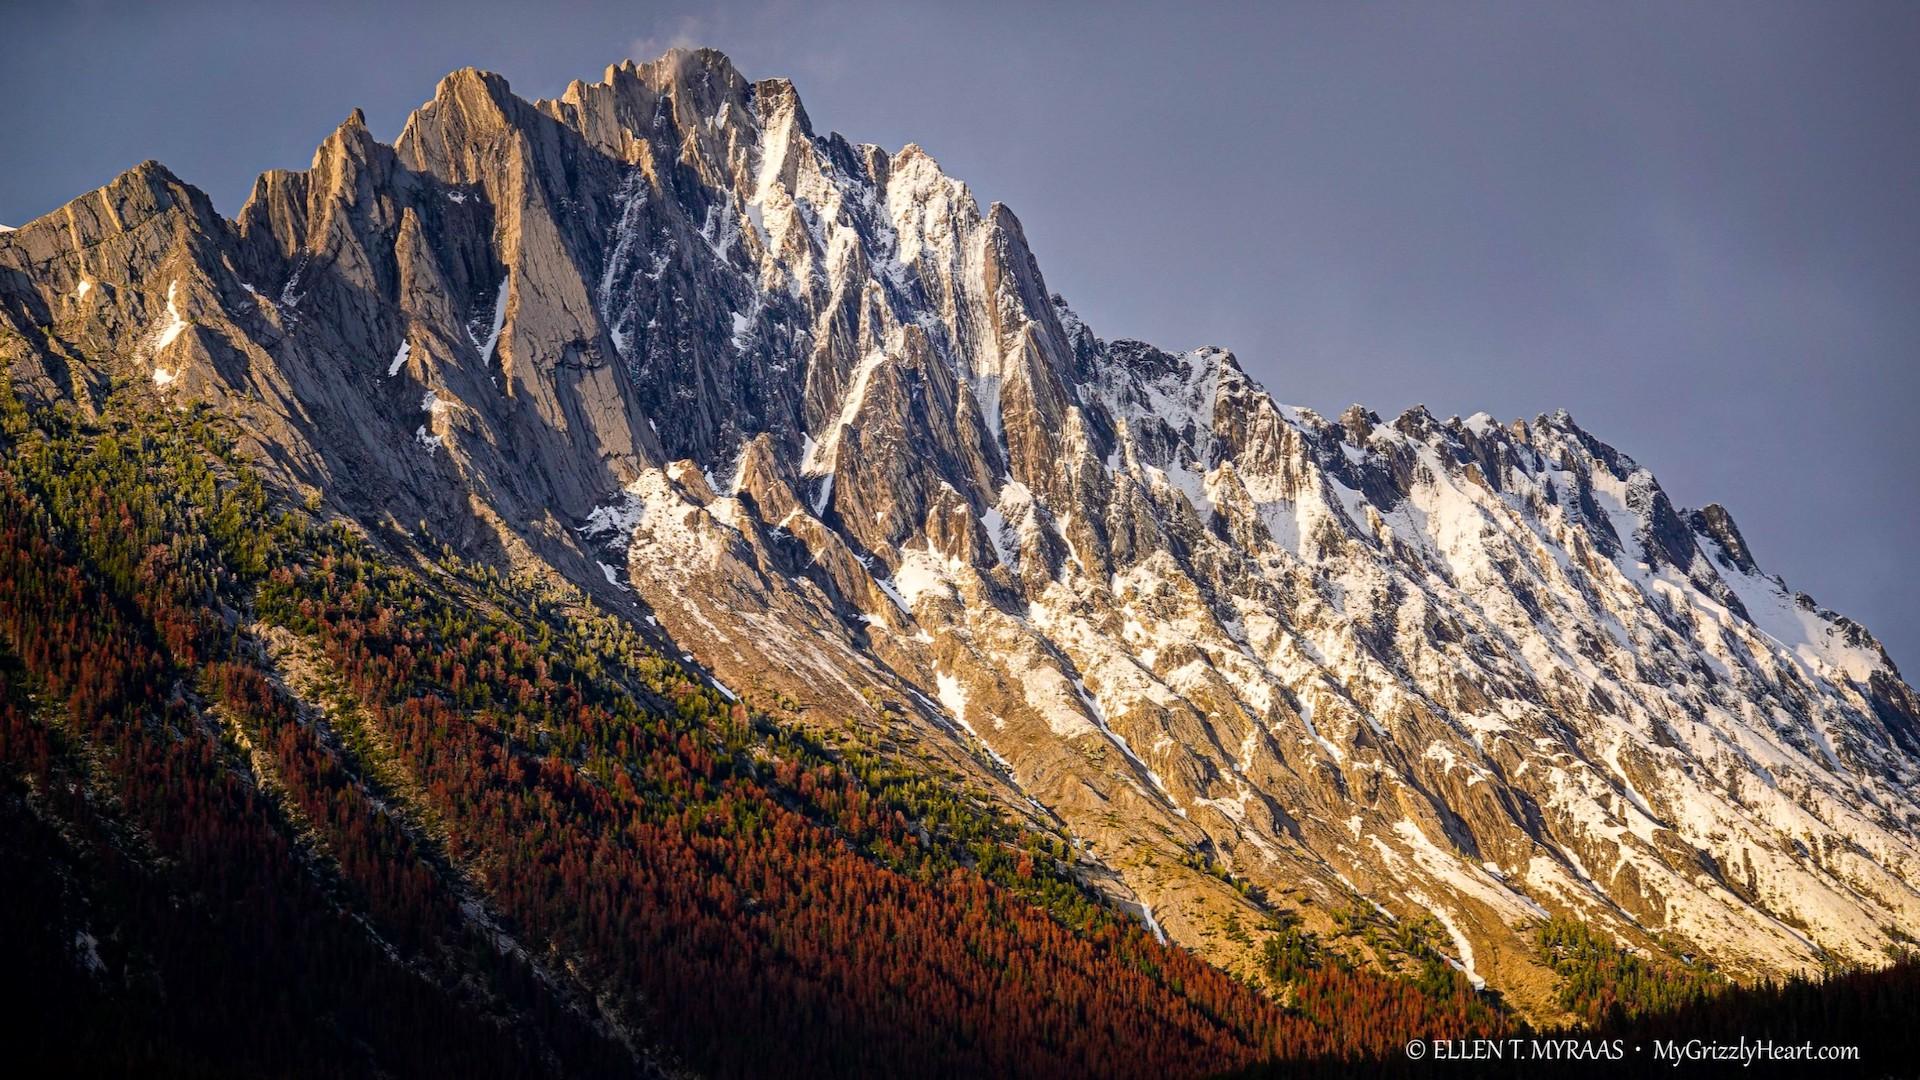 Canadian Rocky Mountains - Jasper Peaks - Mount CR2 in The Colin Range